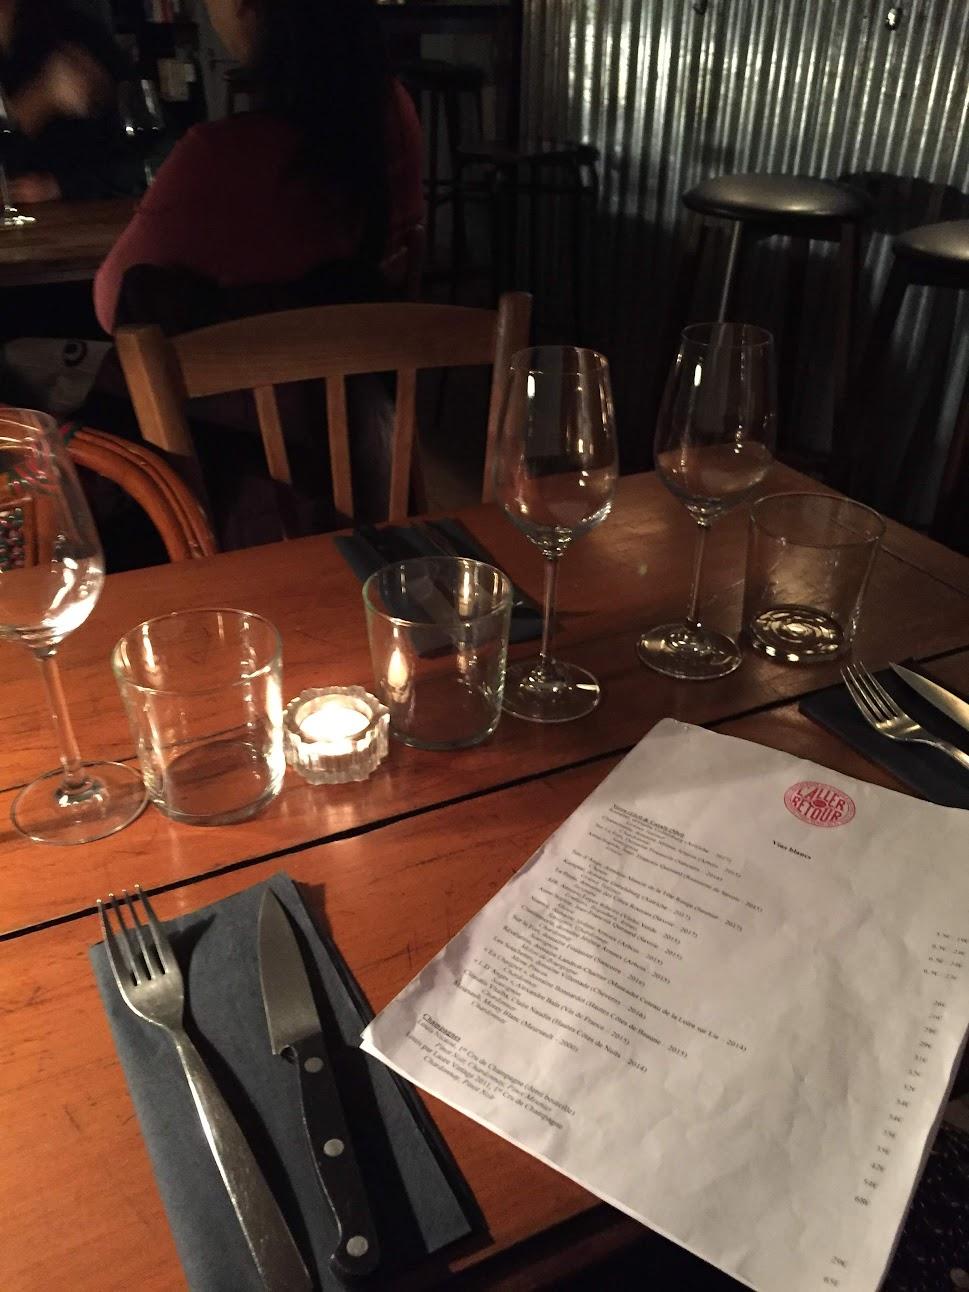 L'aller Retour Steak コートドブッフ パリ ビストロ レストラン フランス料理 ラバロック 店内